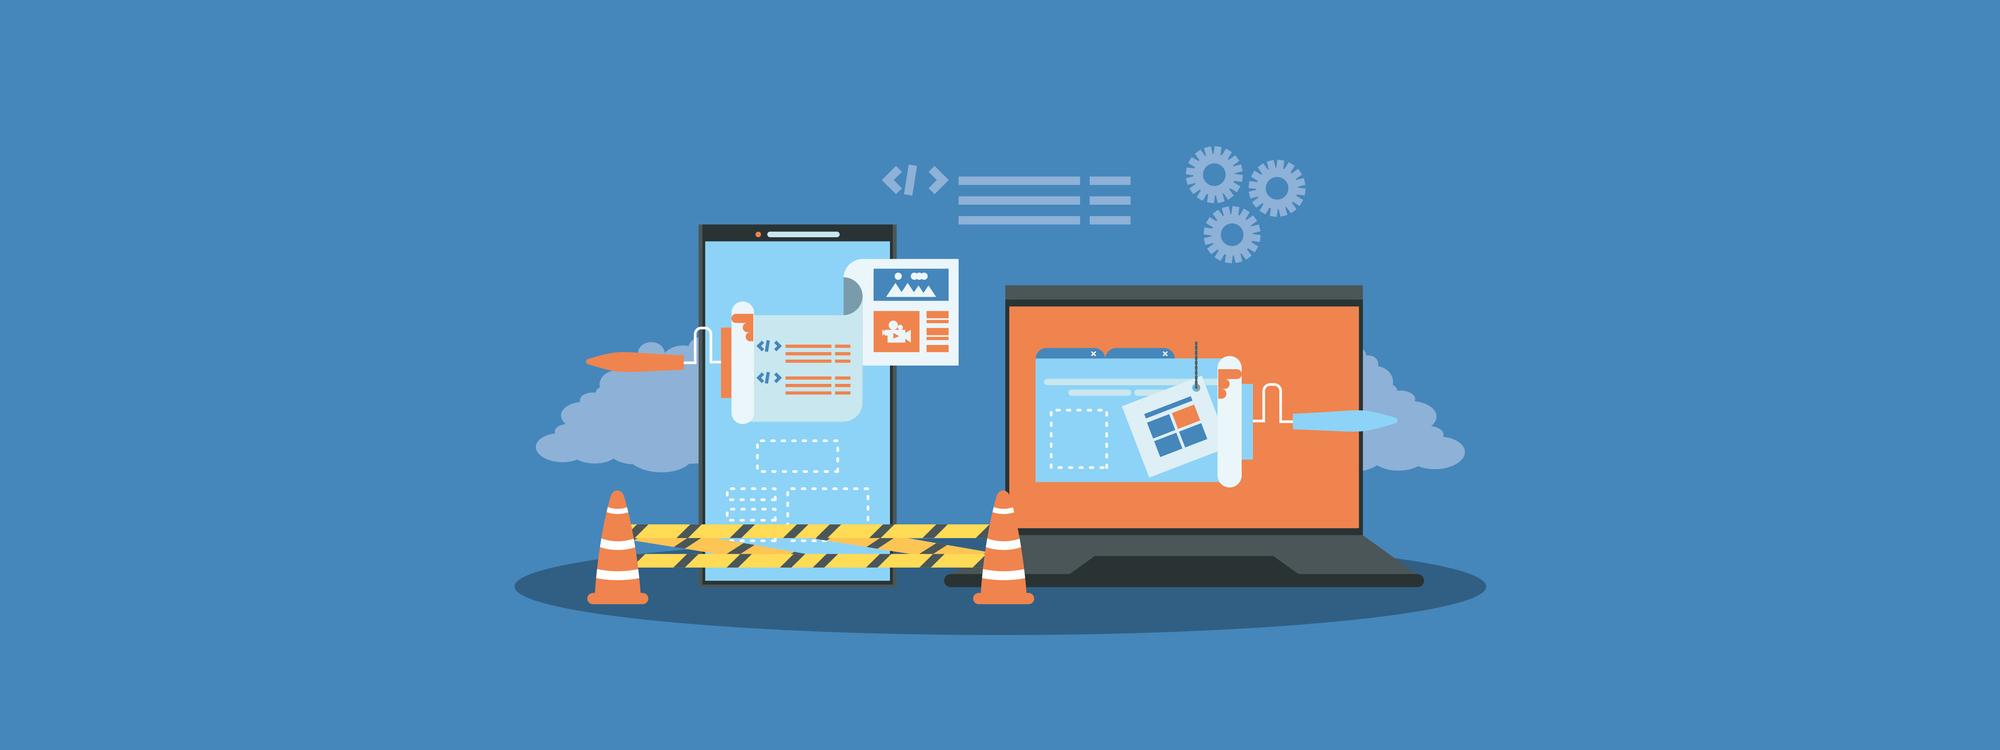 illustrated website under construction in mobile and desktop formate